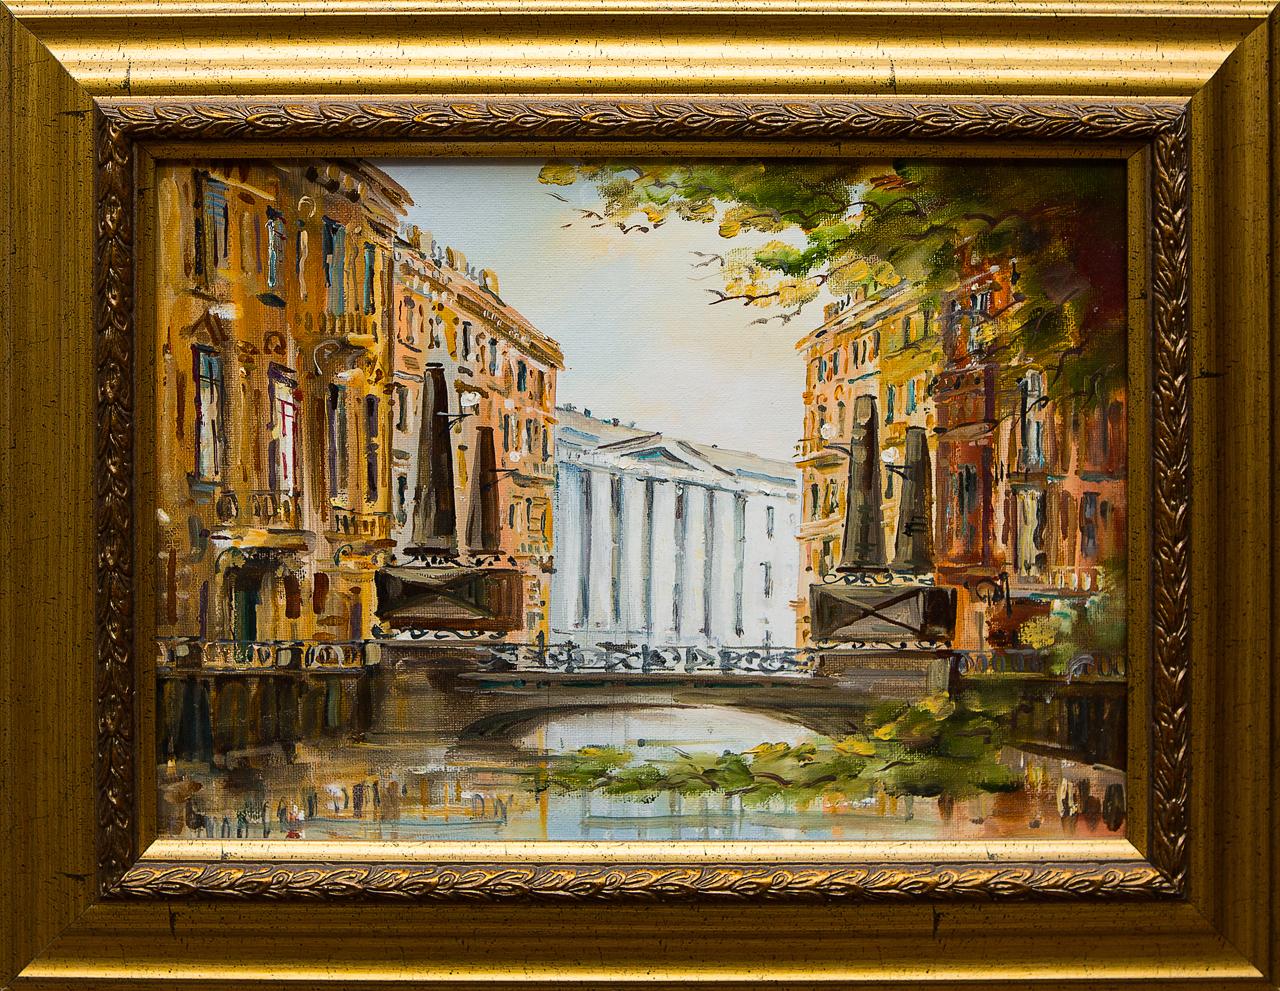 Картина маслом Канал Грибоедова Шеренкова картина маслом город шеренкова